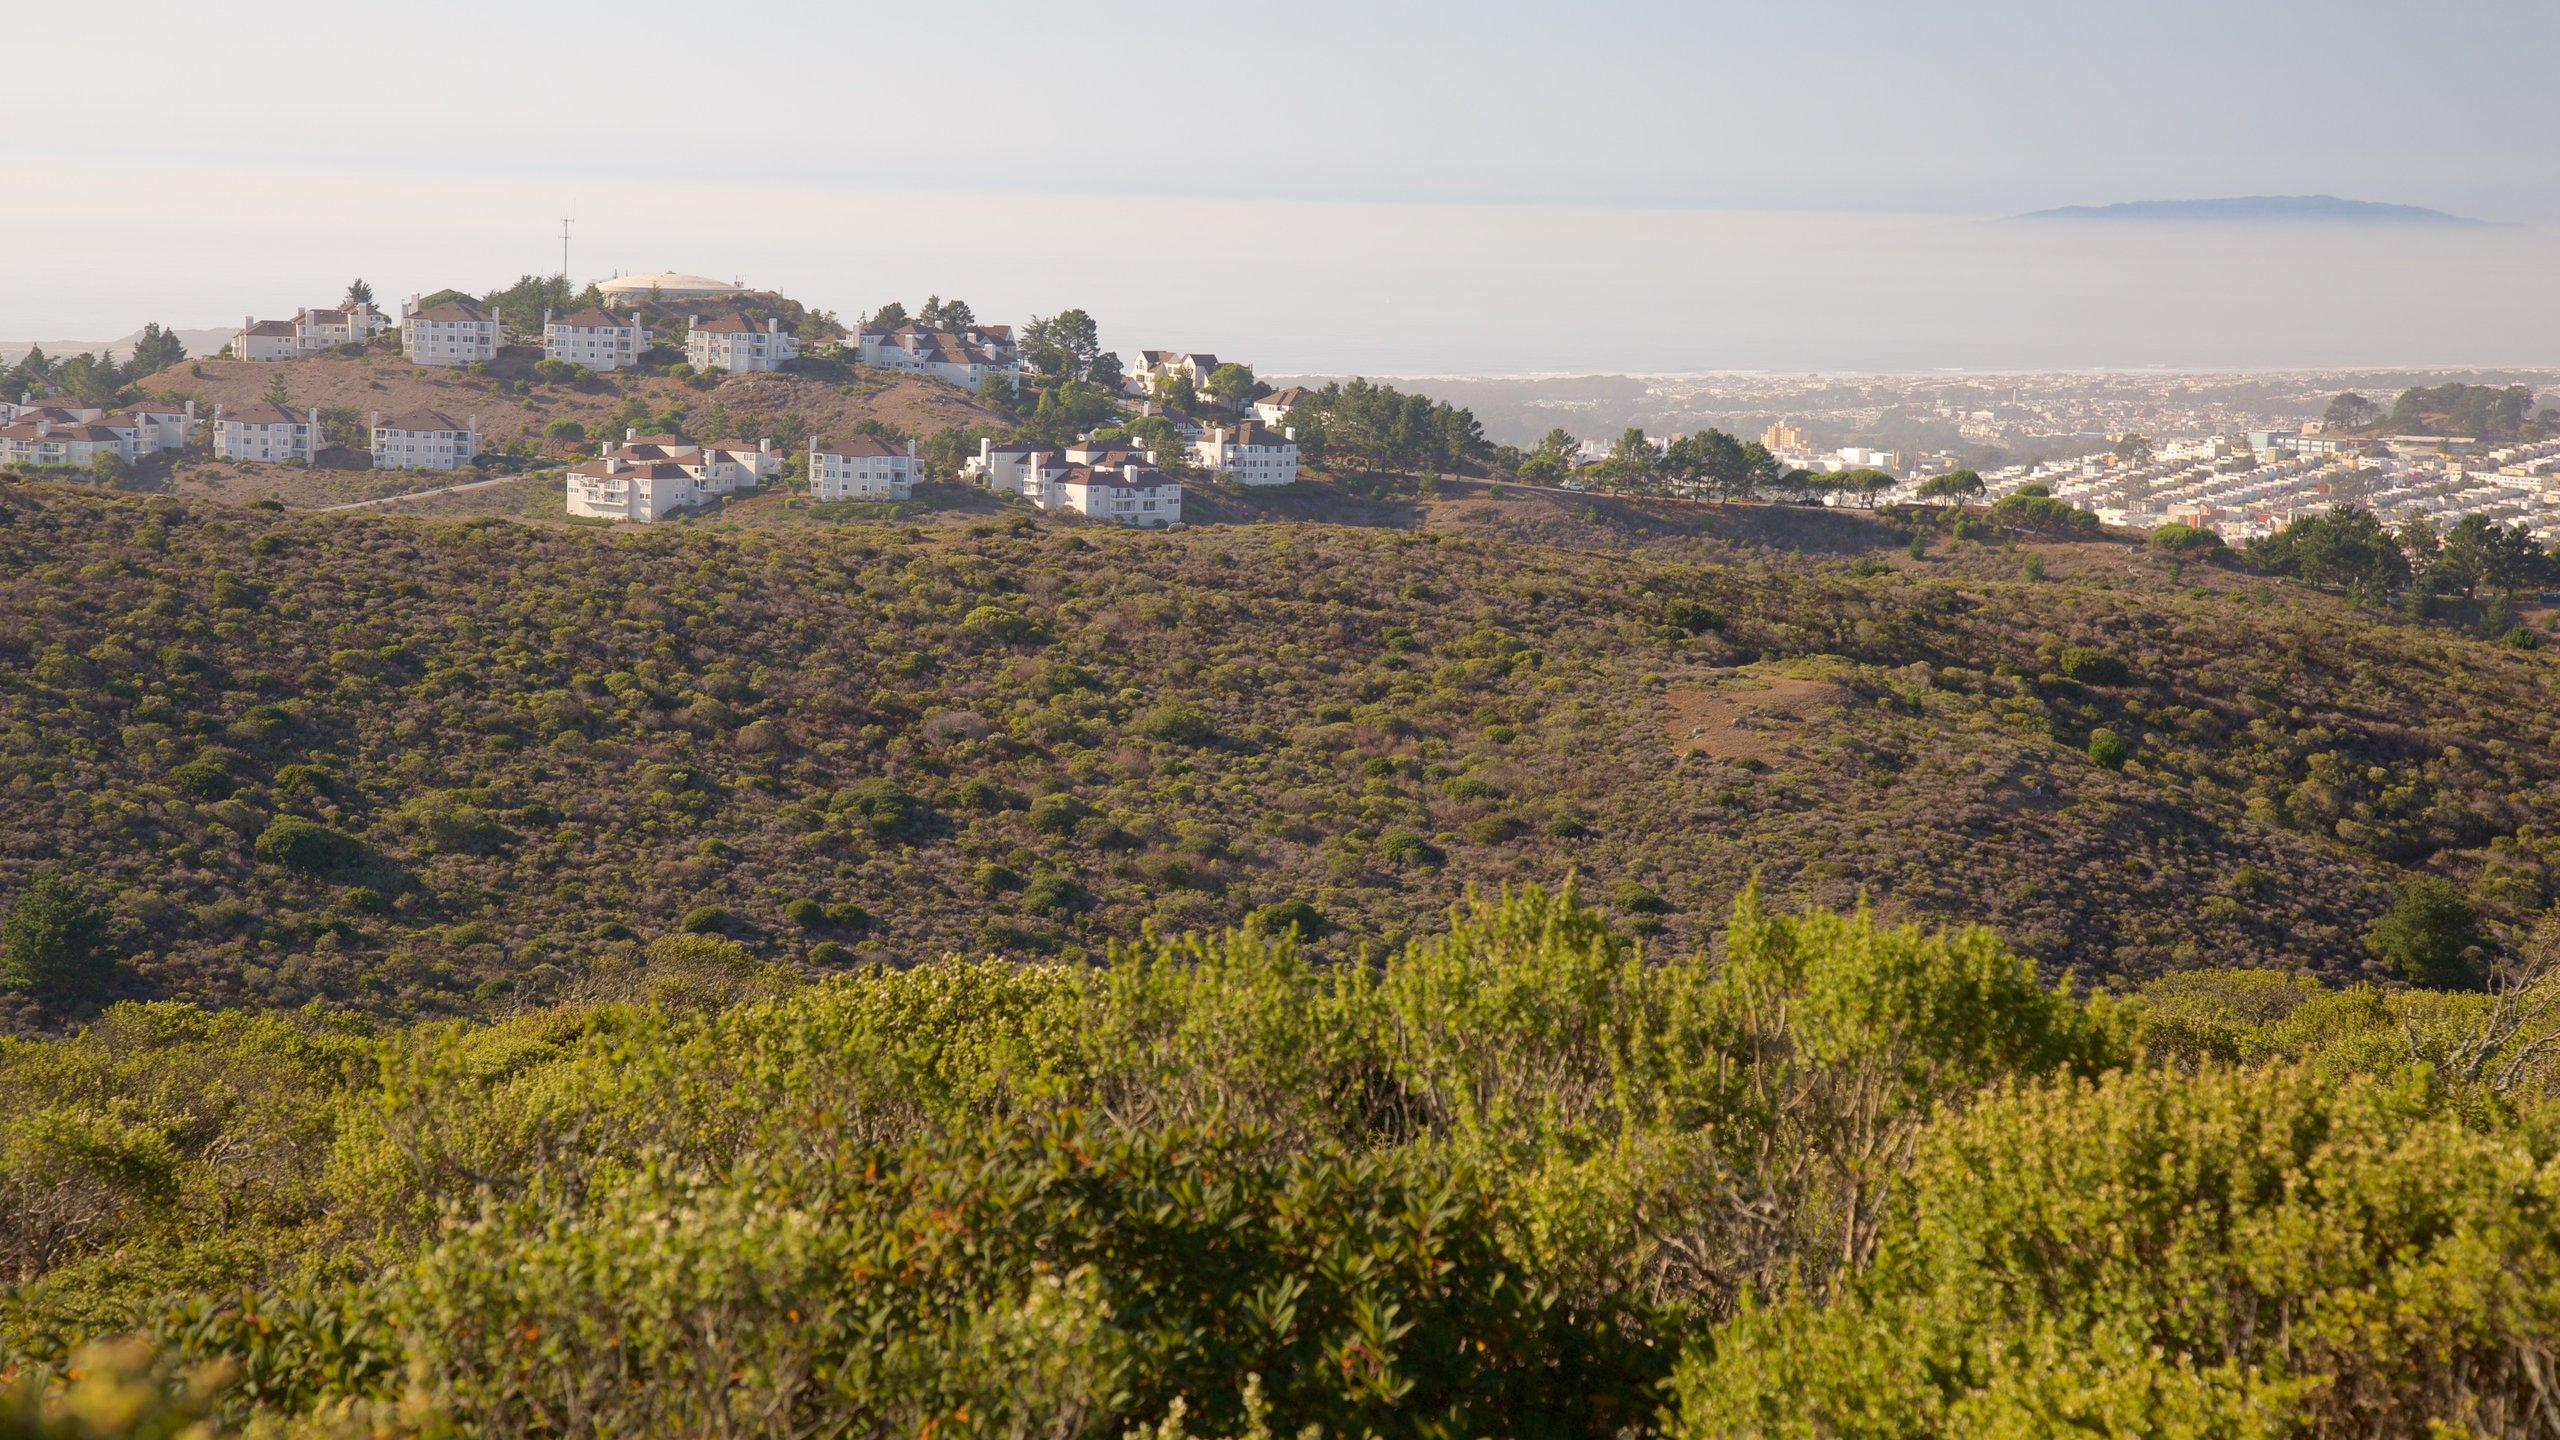 San Mateo County, California, United States of America